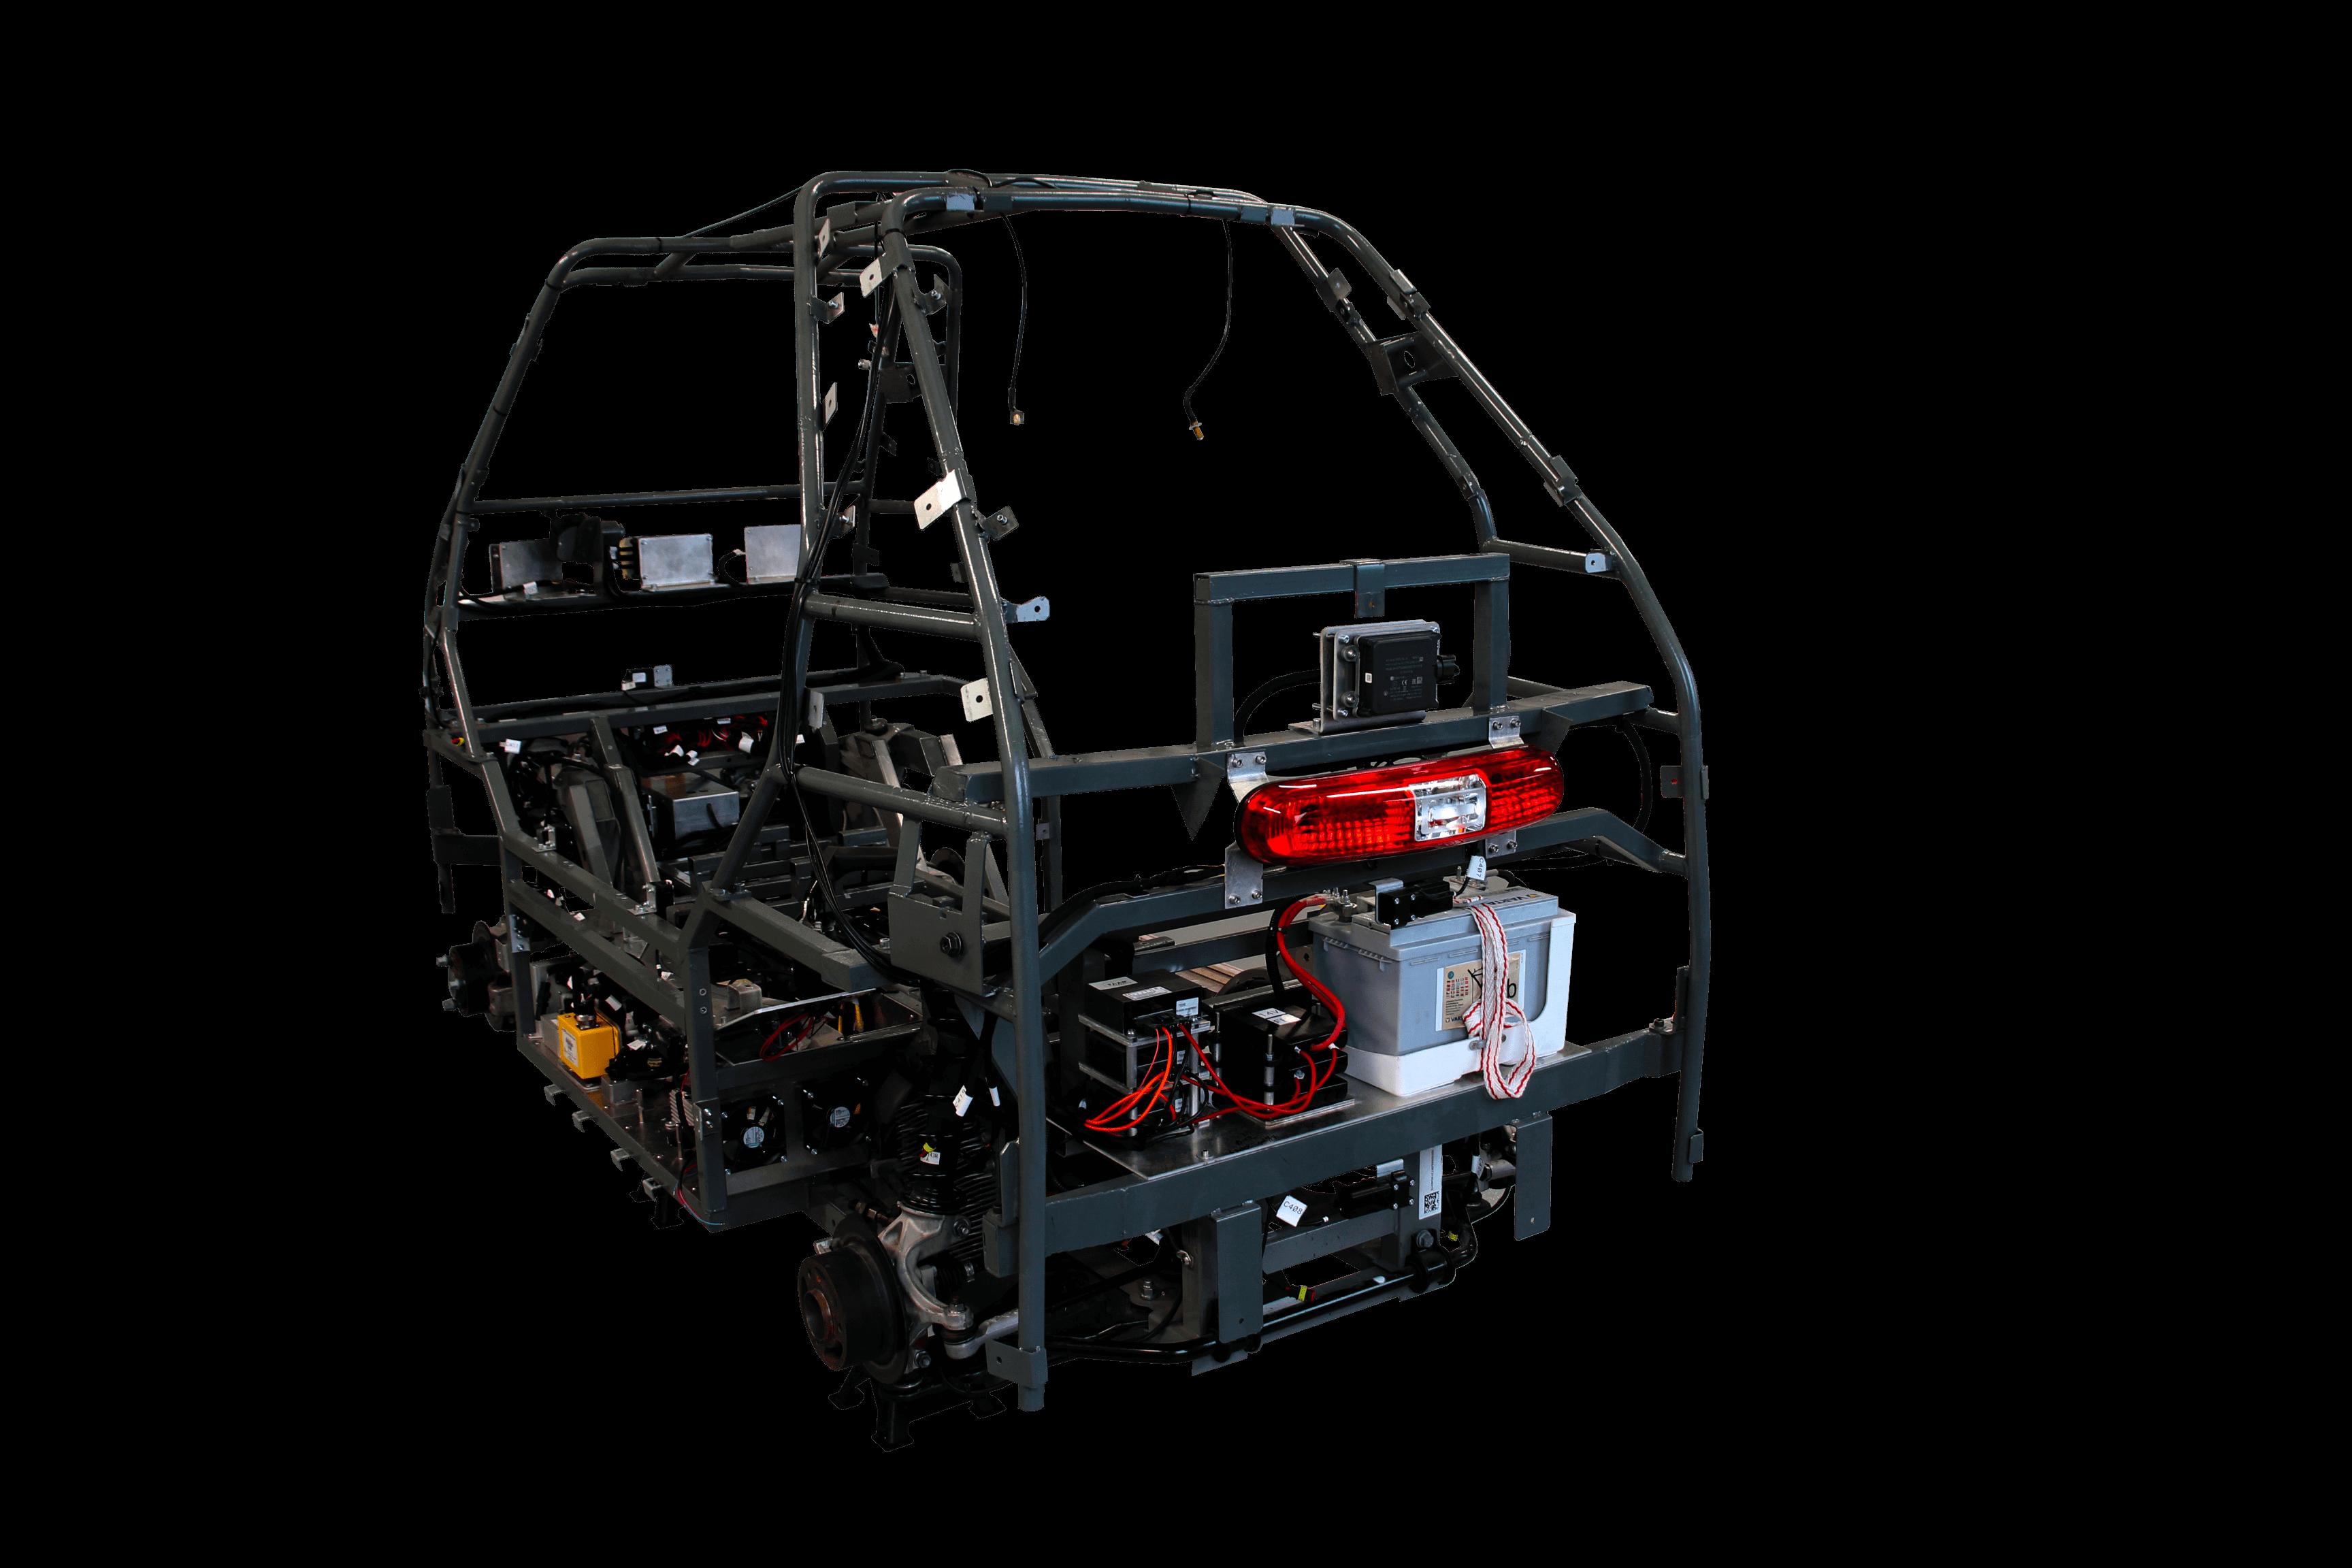 Faar commercialises robotic vehicle platform for testing